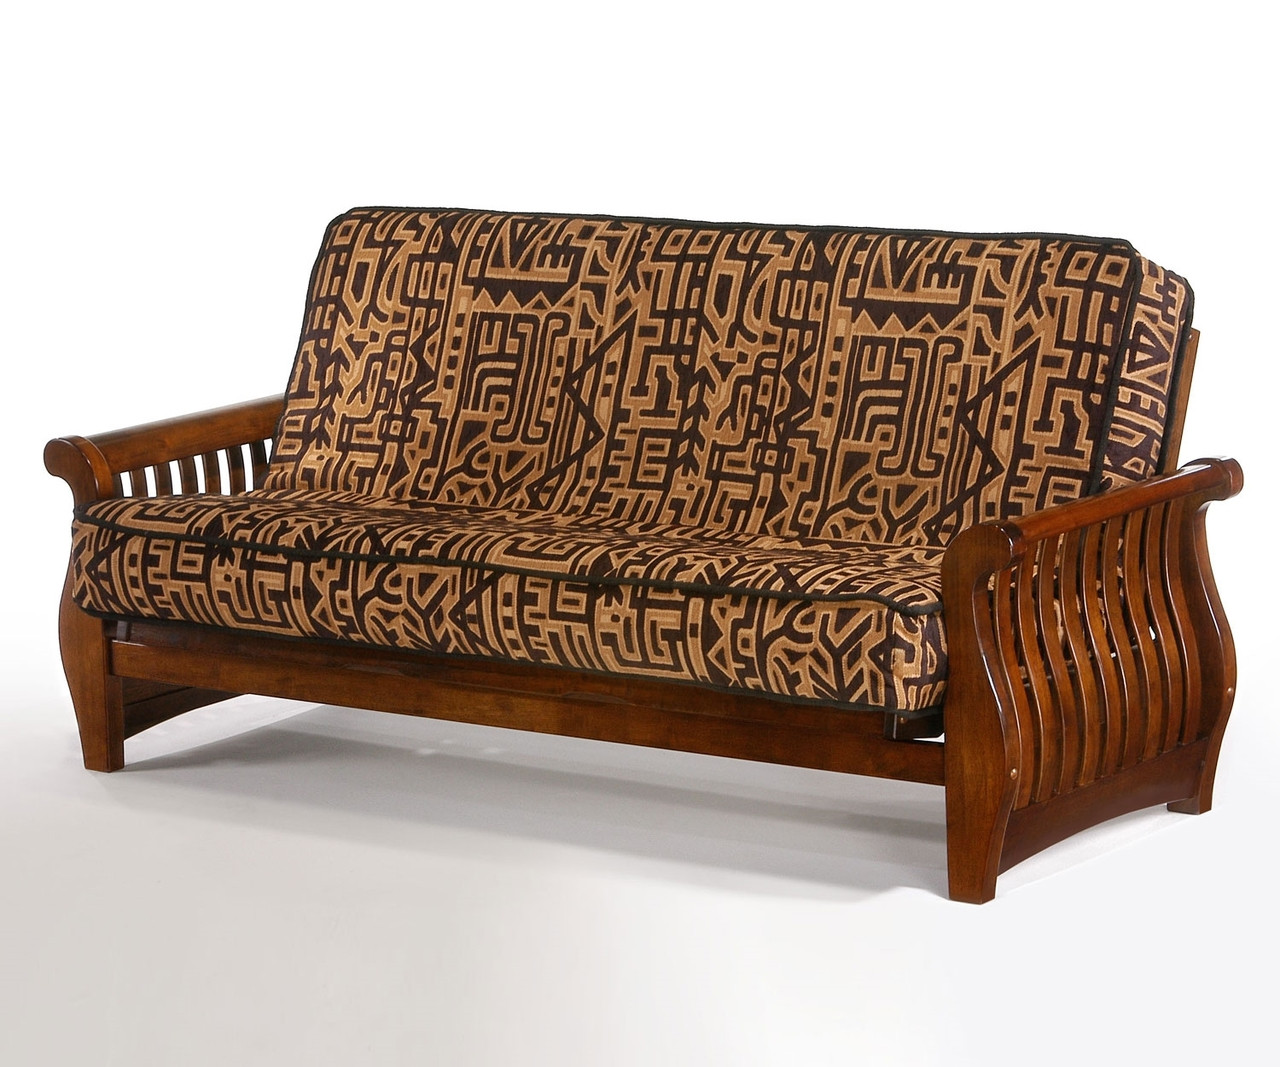 Superbe Nightfall Futon Sofa Black Walnut   Night And Day Furniture    ND Nightfall BW